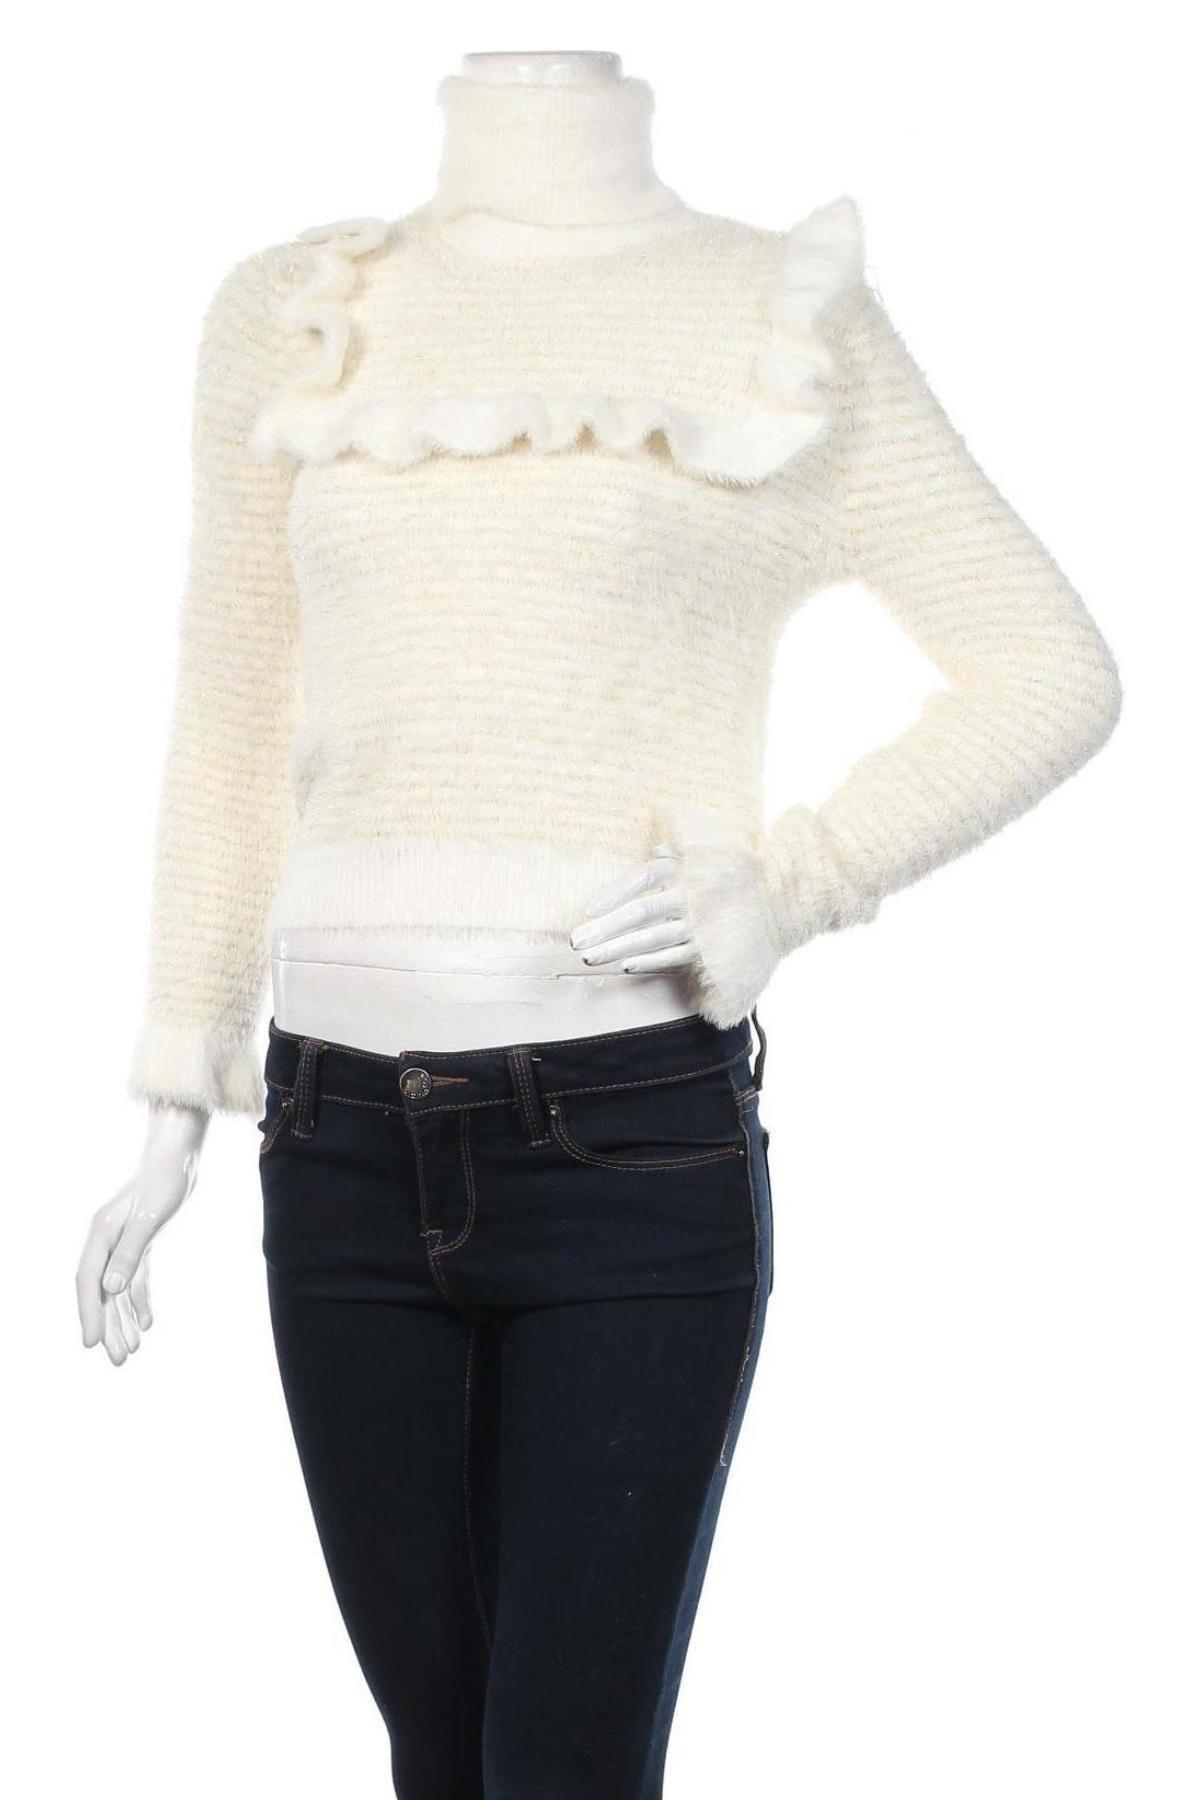 Дамски пуловер Zara, Размер S, Цвят Бял, 73% полиамид, 19% полиестер, 6% вискоза, 2% метални нишки, Цена 51,75лв.